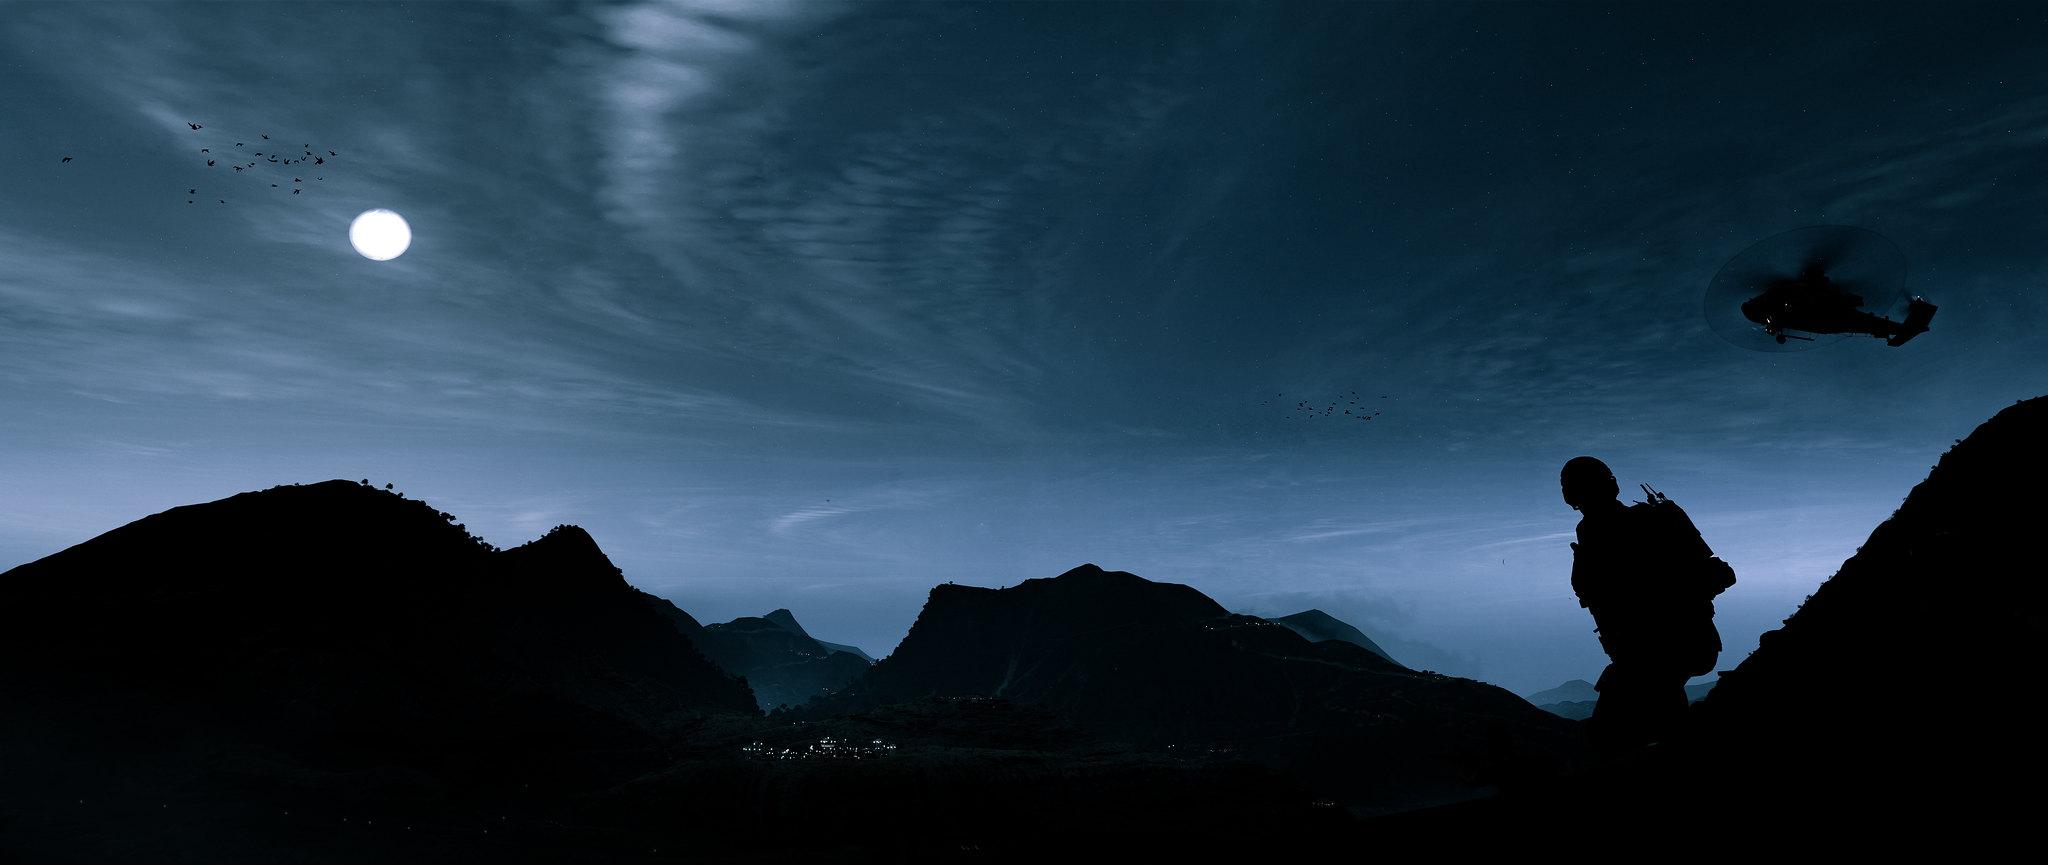 49096679822_72eaec1b2d_k.jpg - Tom Clancy's Ghost Recon: Wildlands